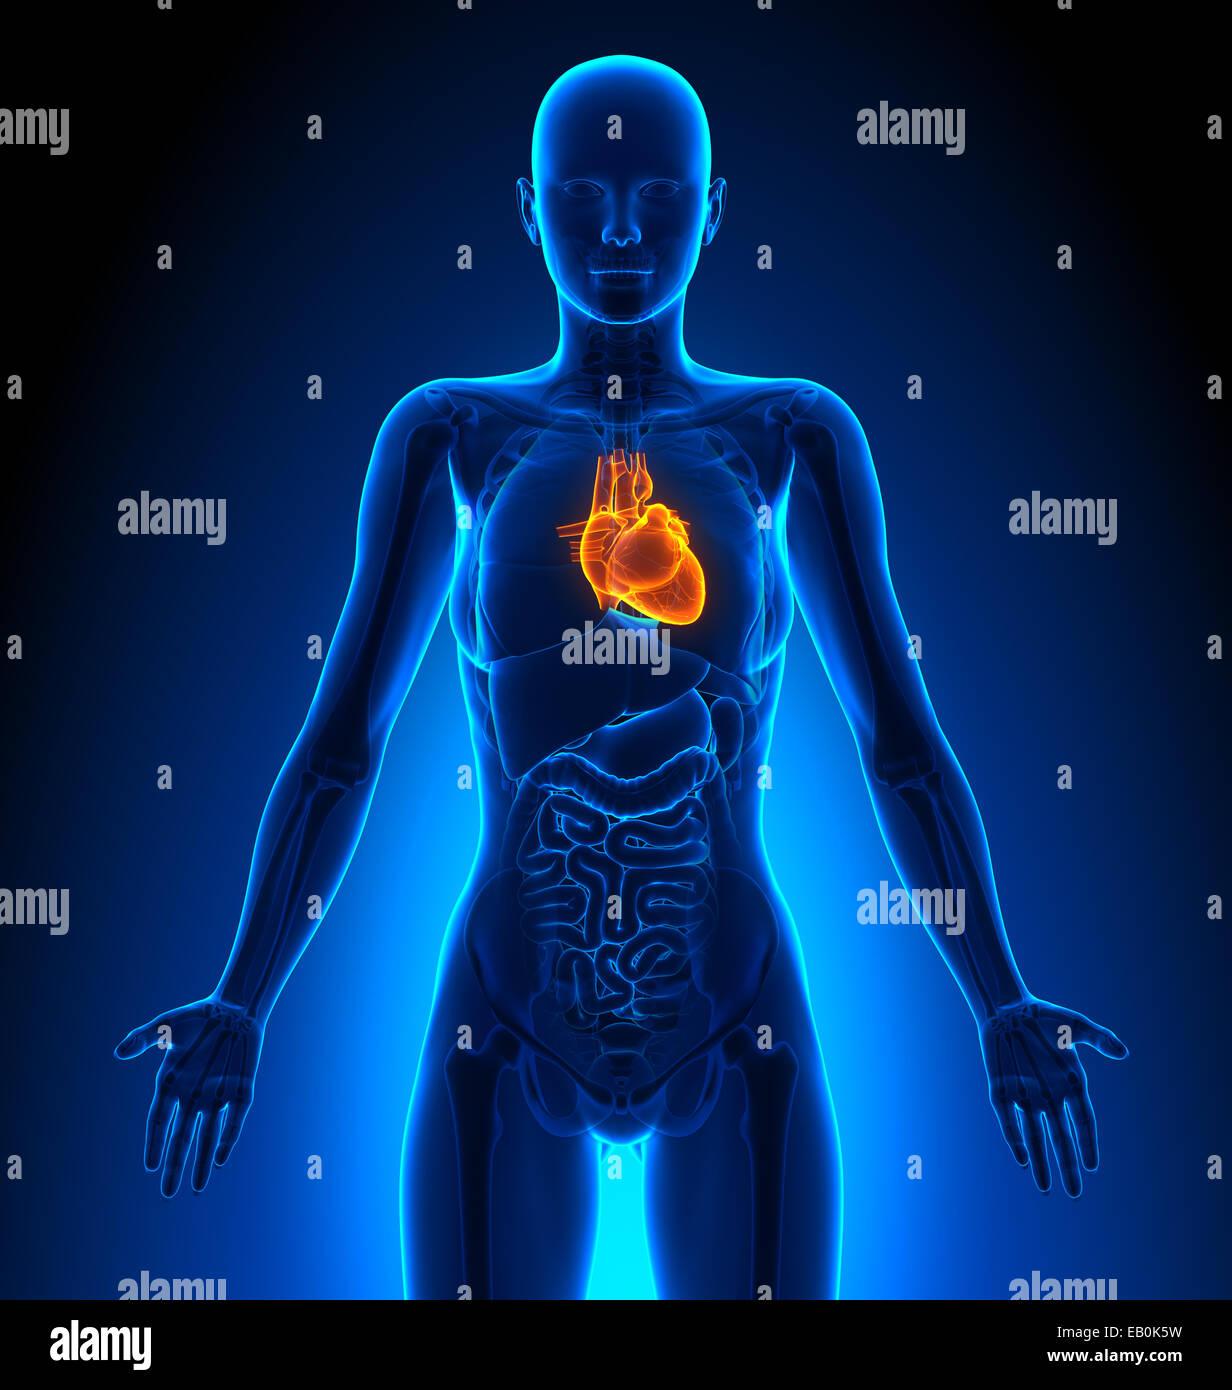 Heart Female Organs Human Anatomy Stock Photo 75617749 Alamy